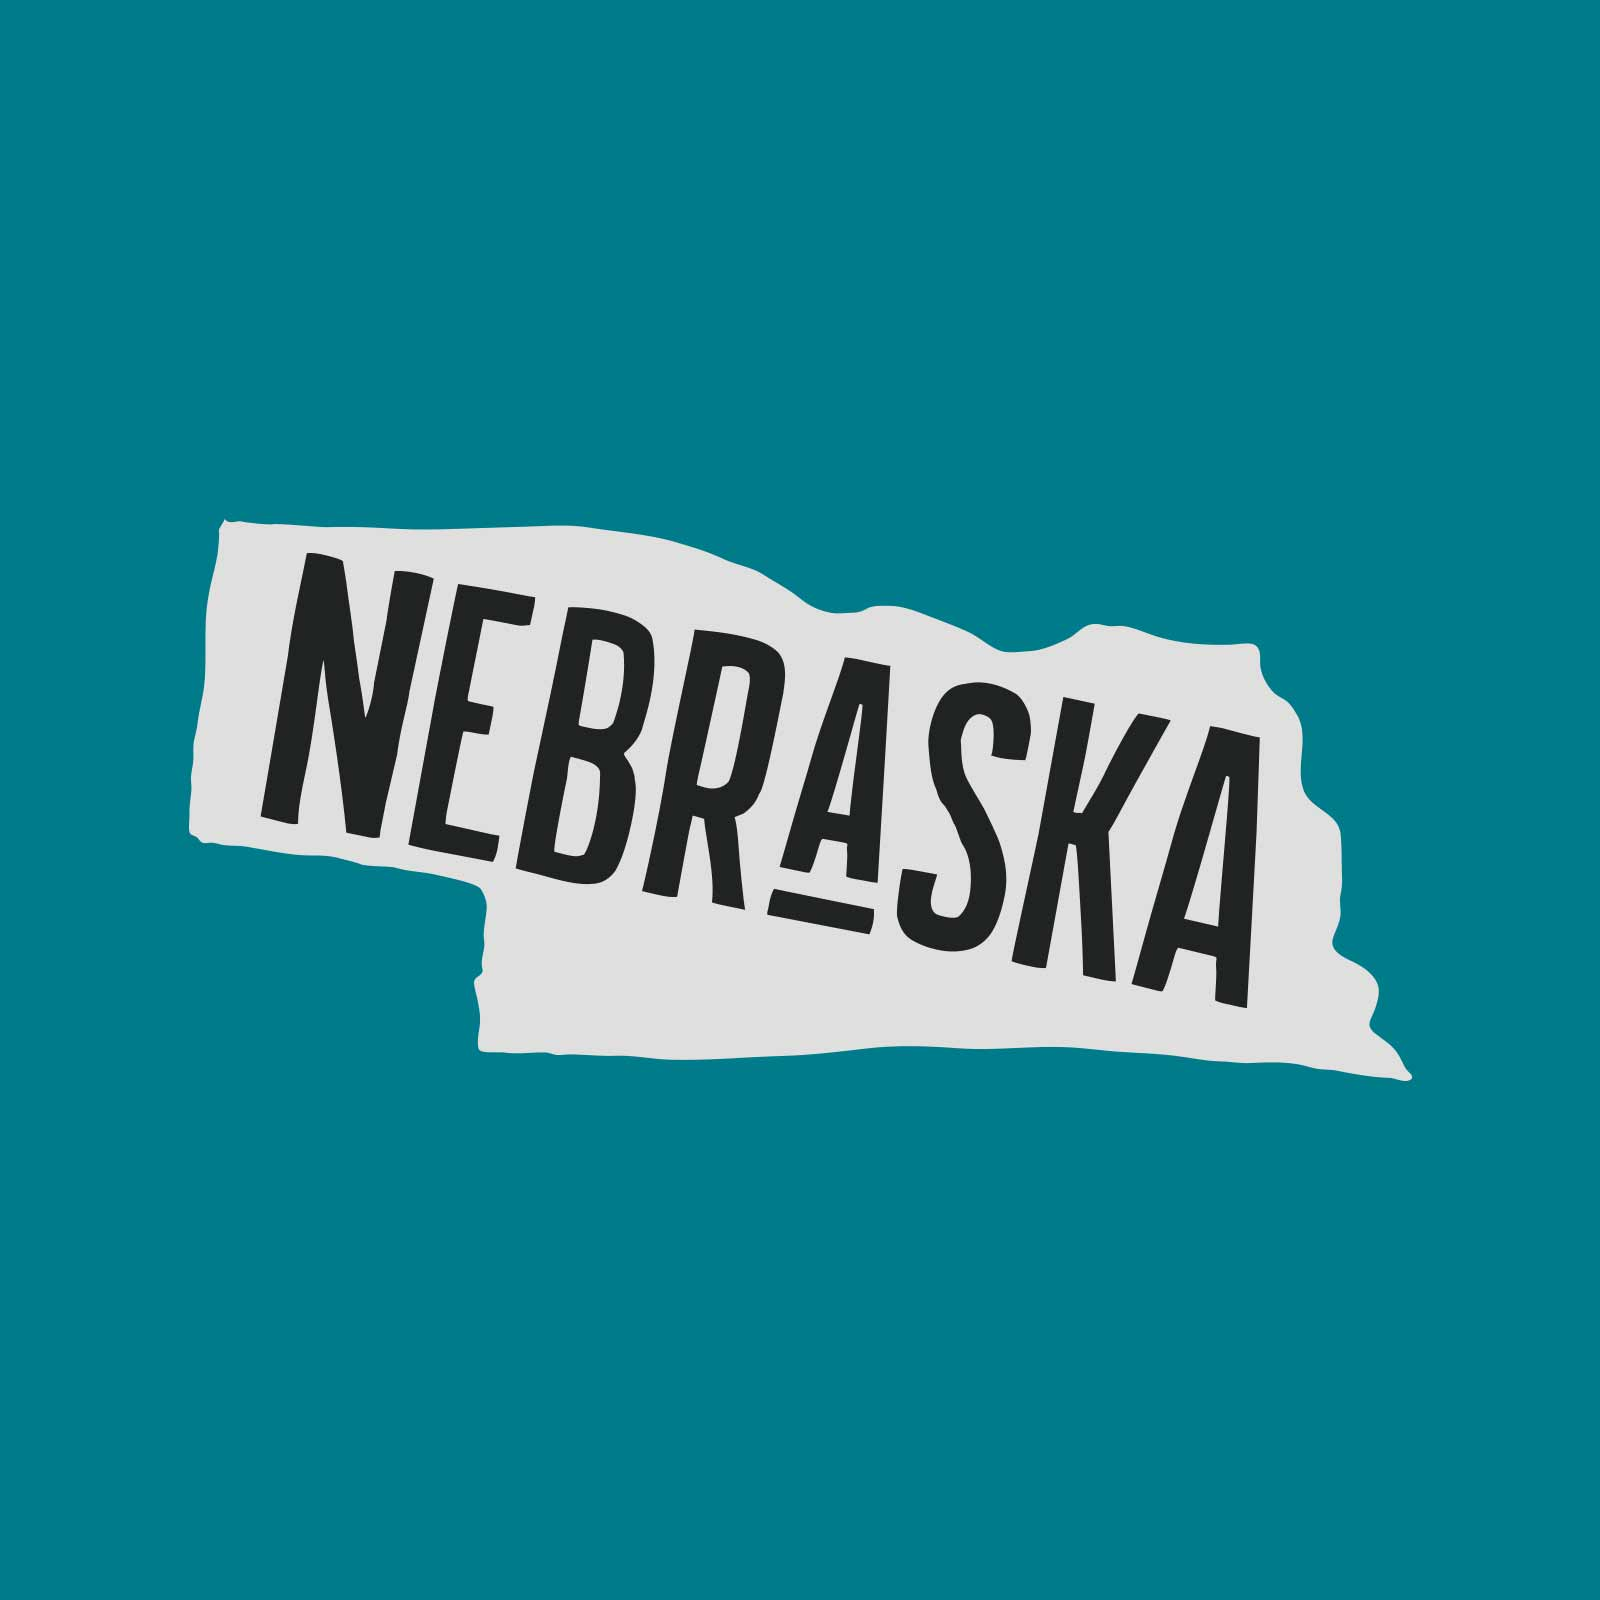 How to start a business in Nebraska